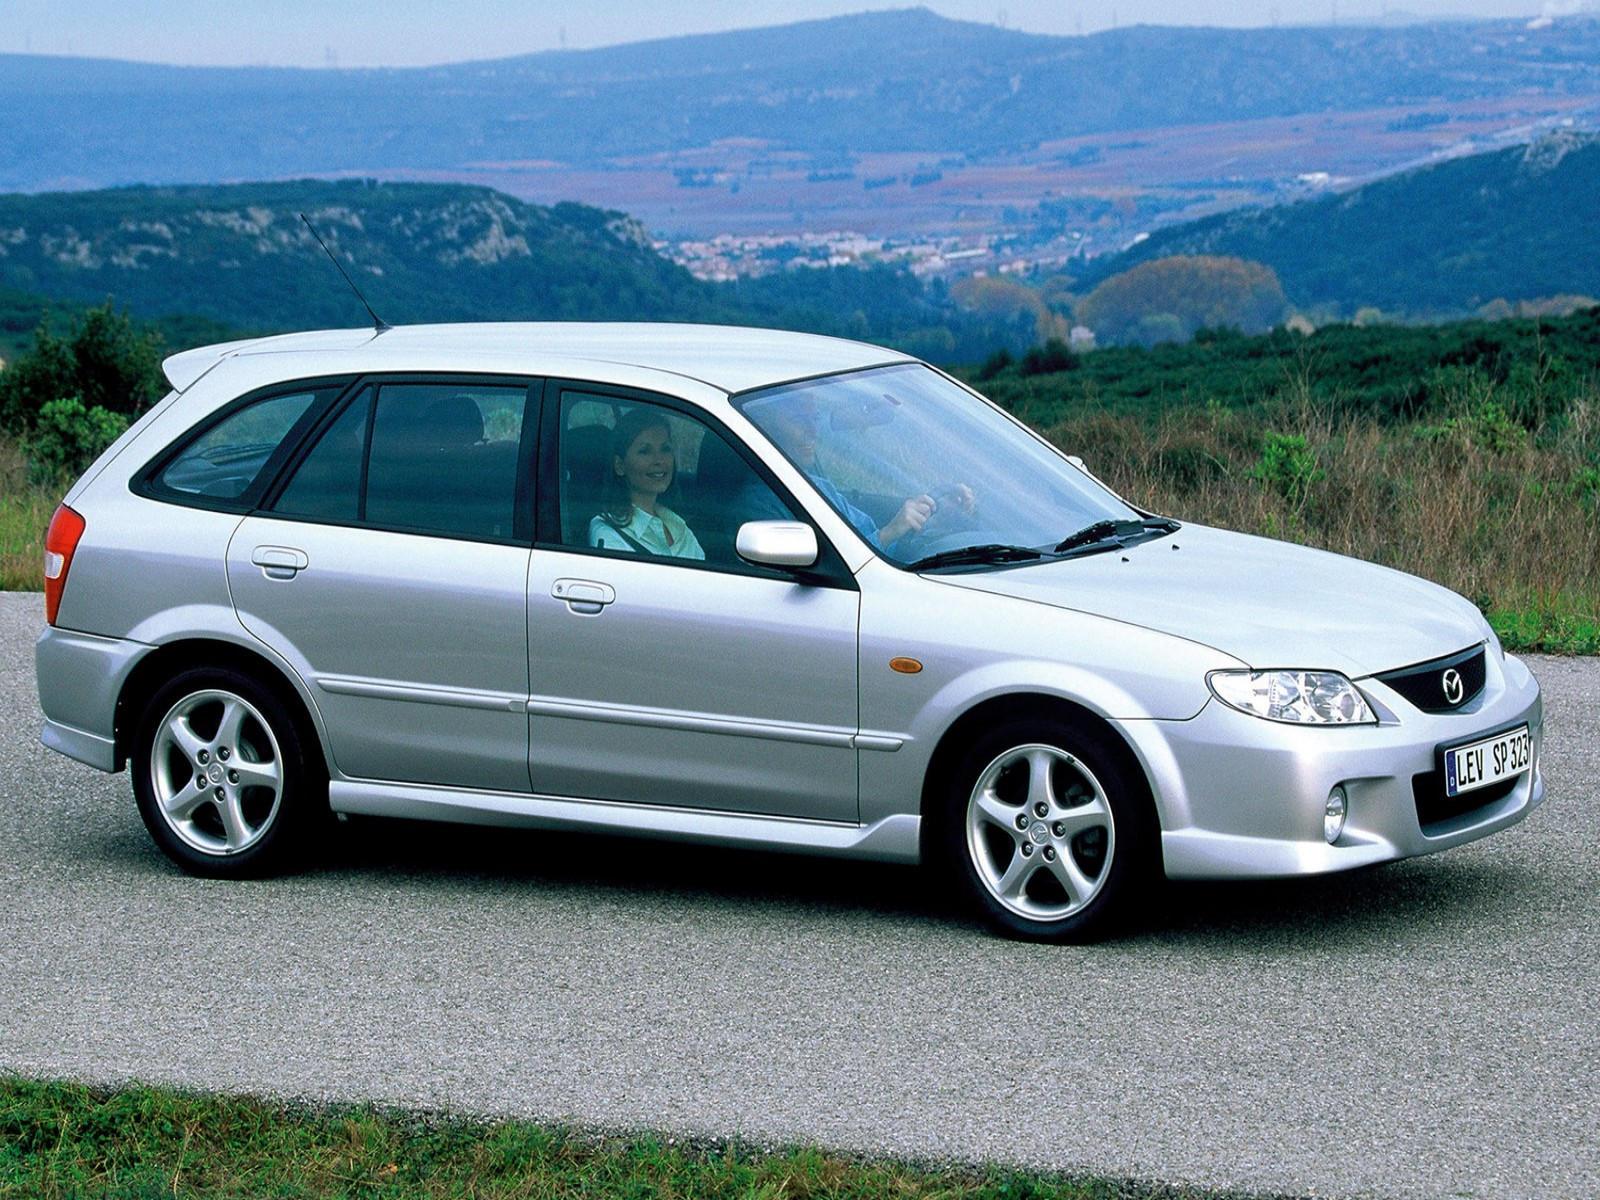 Kekurangan Mazda 323 2000 Spesifikasi